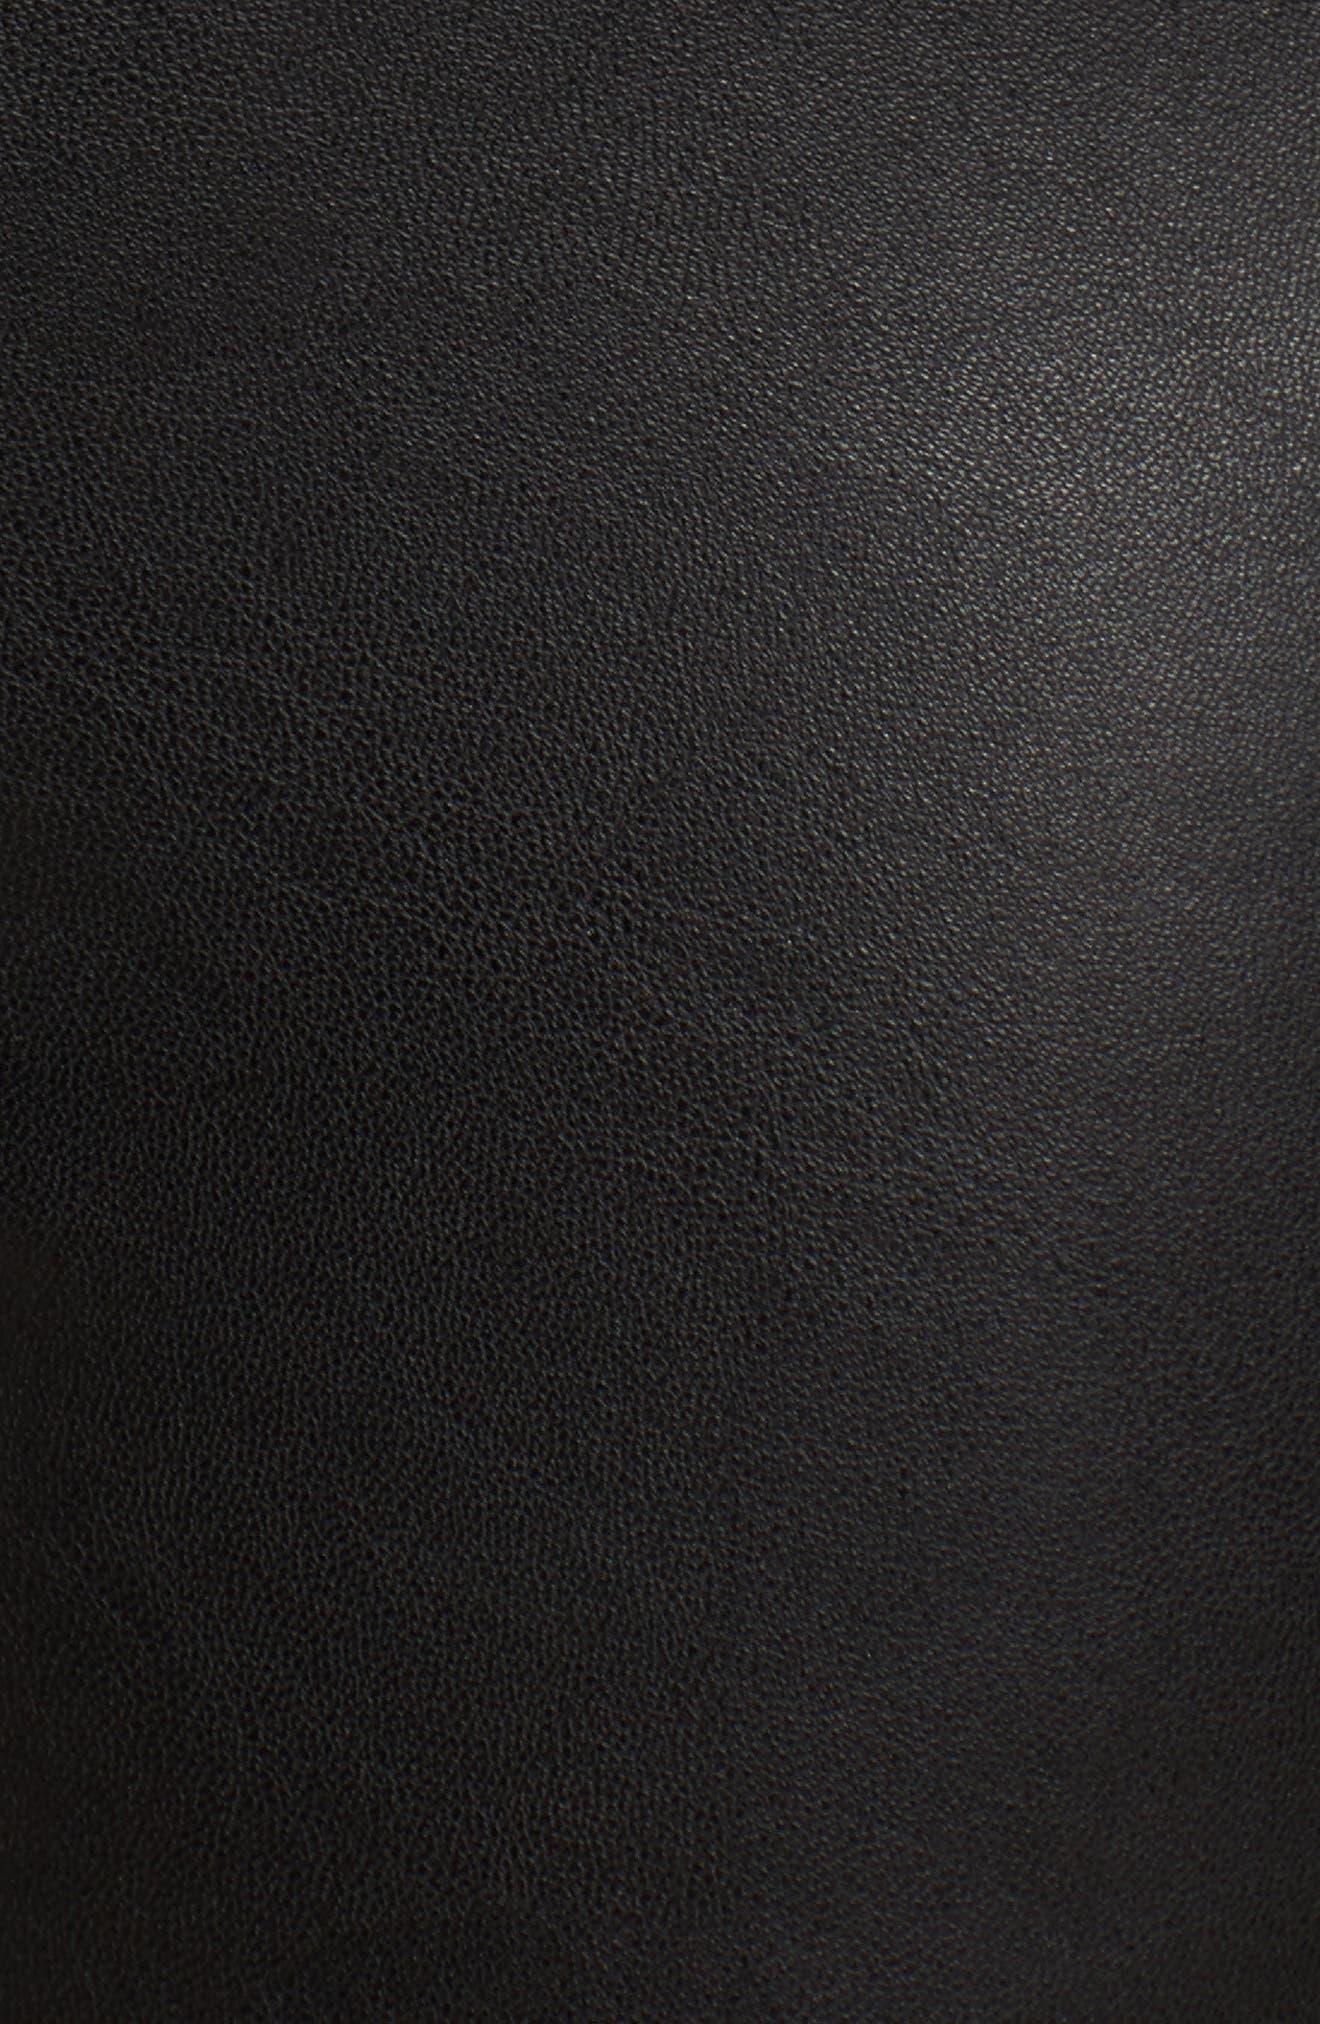 HUE, Leatherette Leggings, Alternate thumbnail 5, color, 001